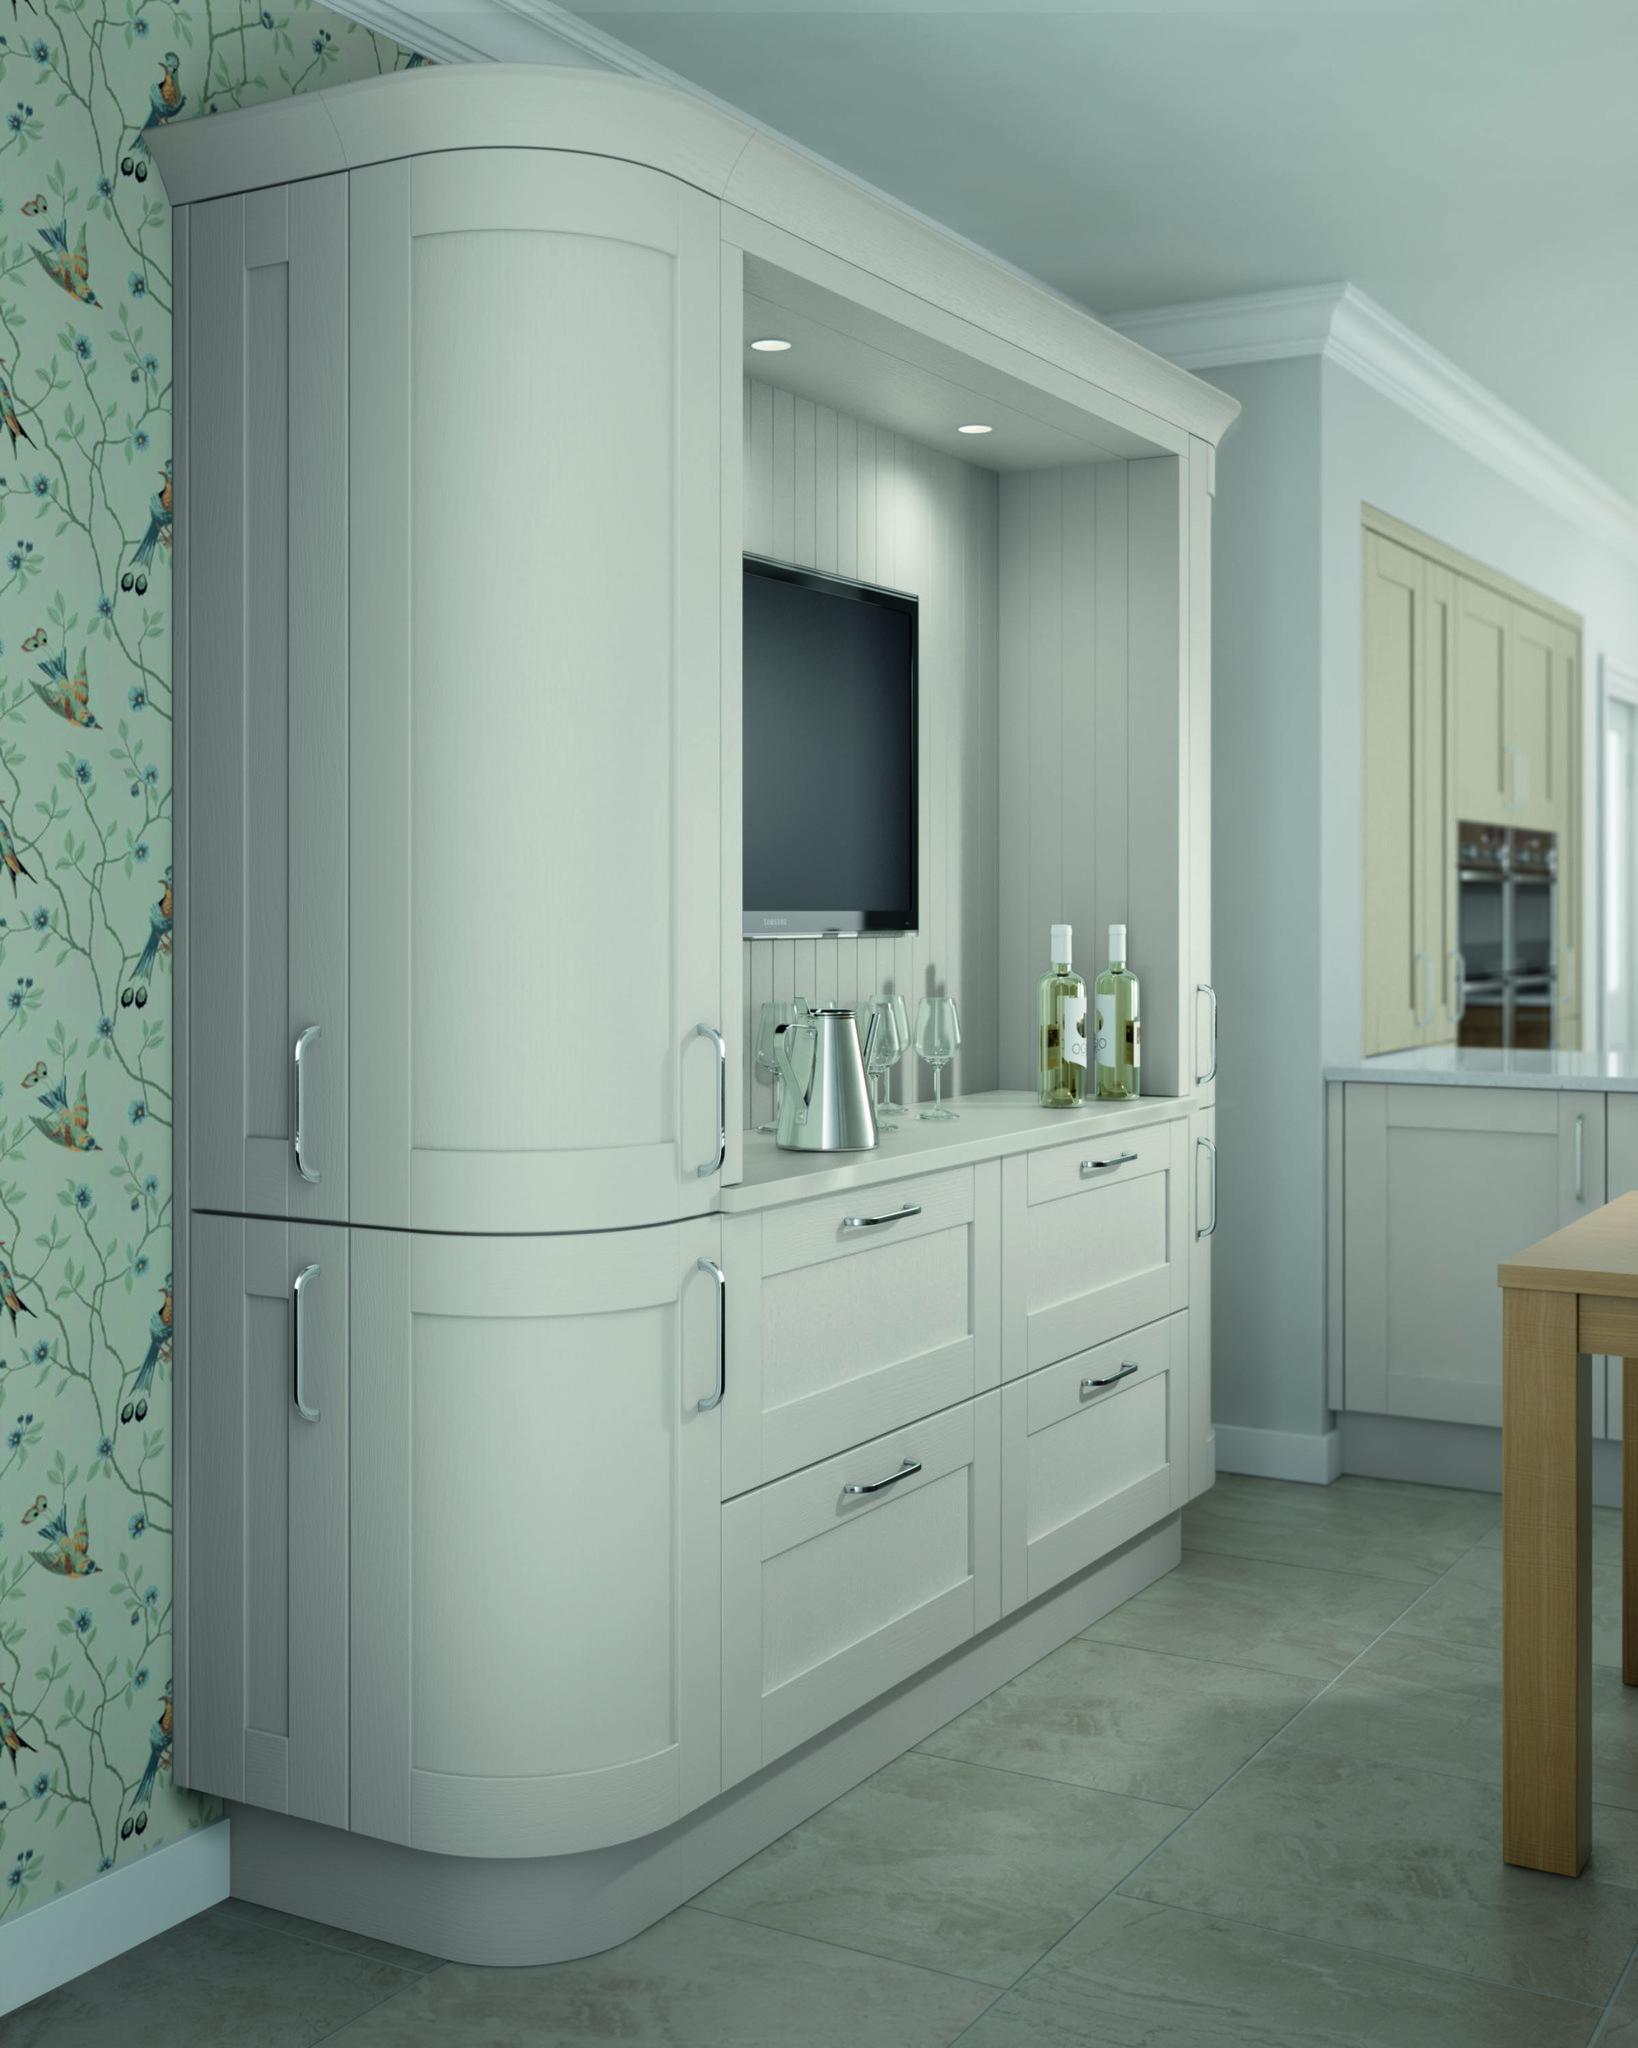 Cambridge Shaker Light Grey Shaker Style Kitchen Cabinet